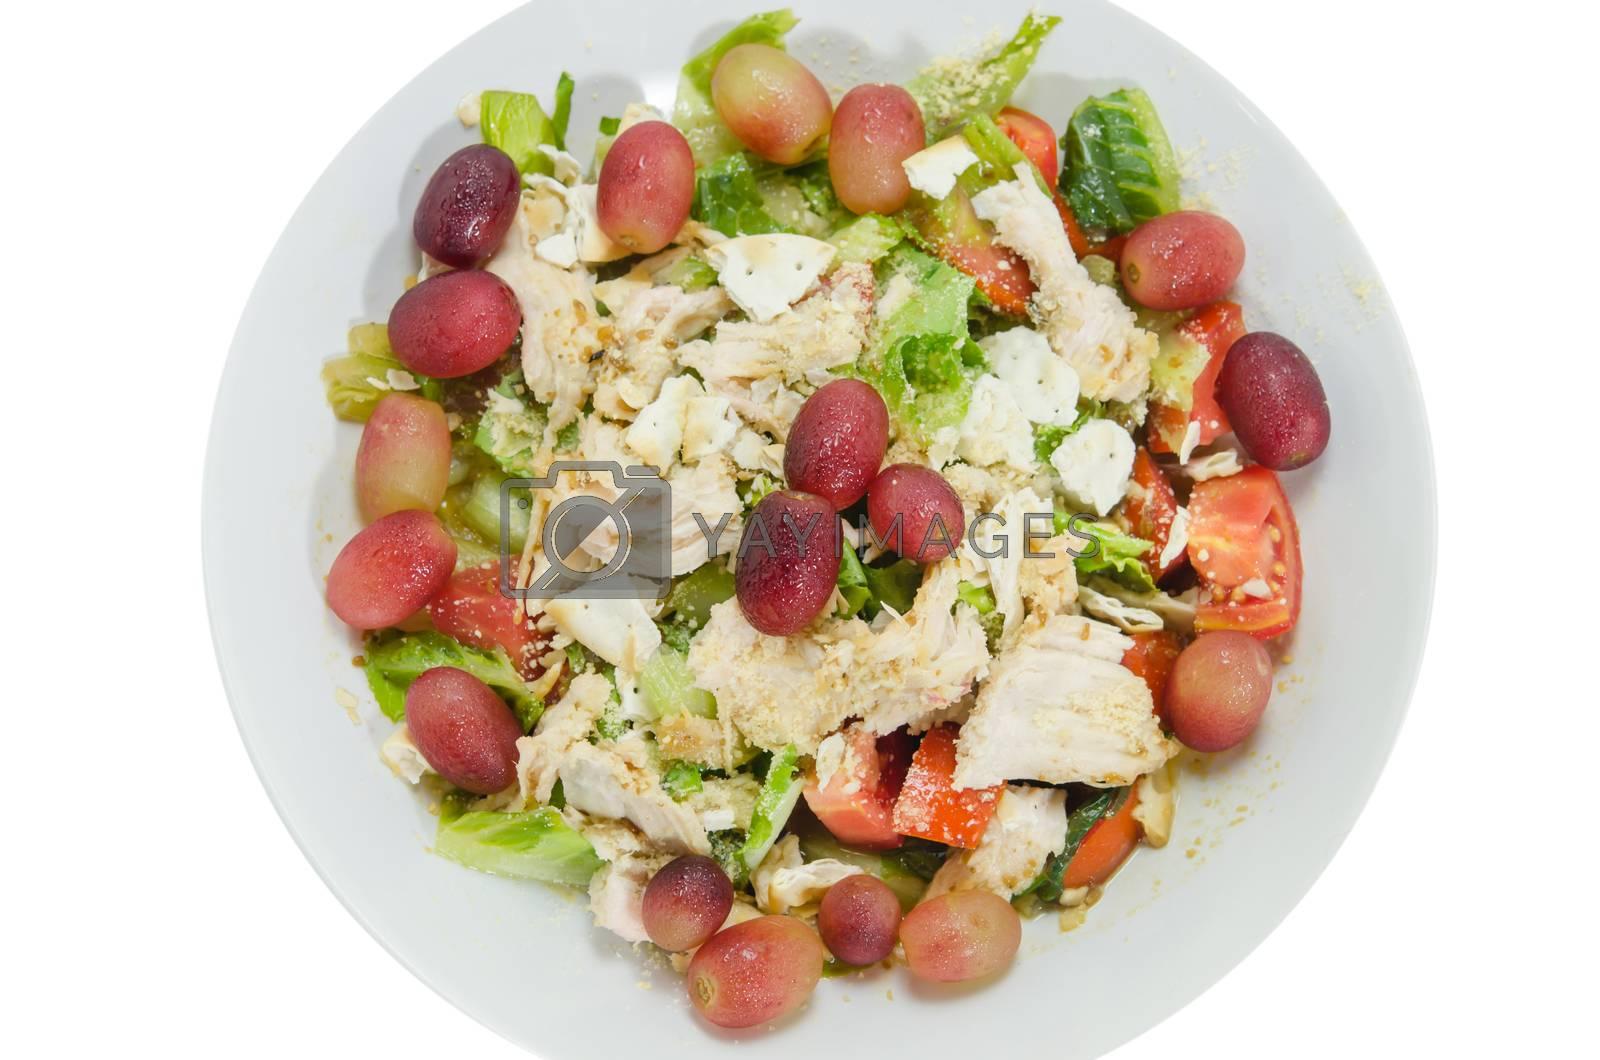 Royalty free image of fresh mix salad by rakratchada